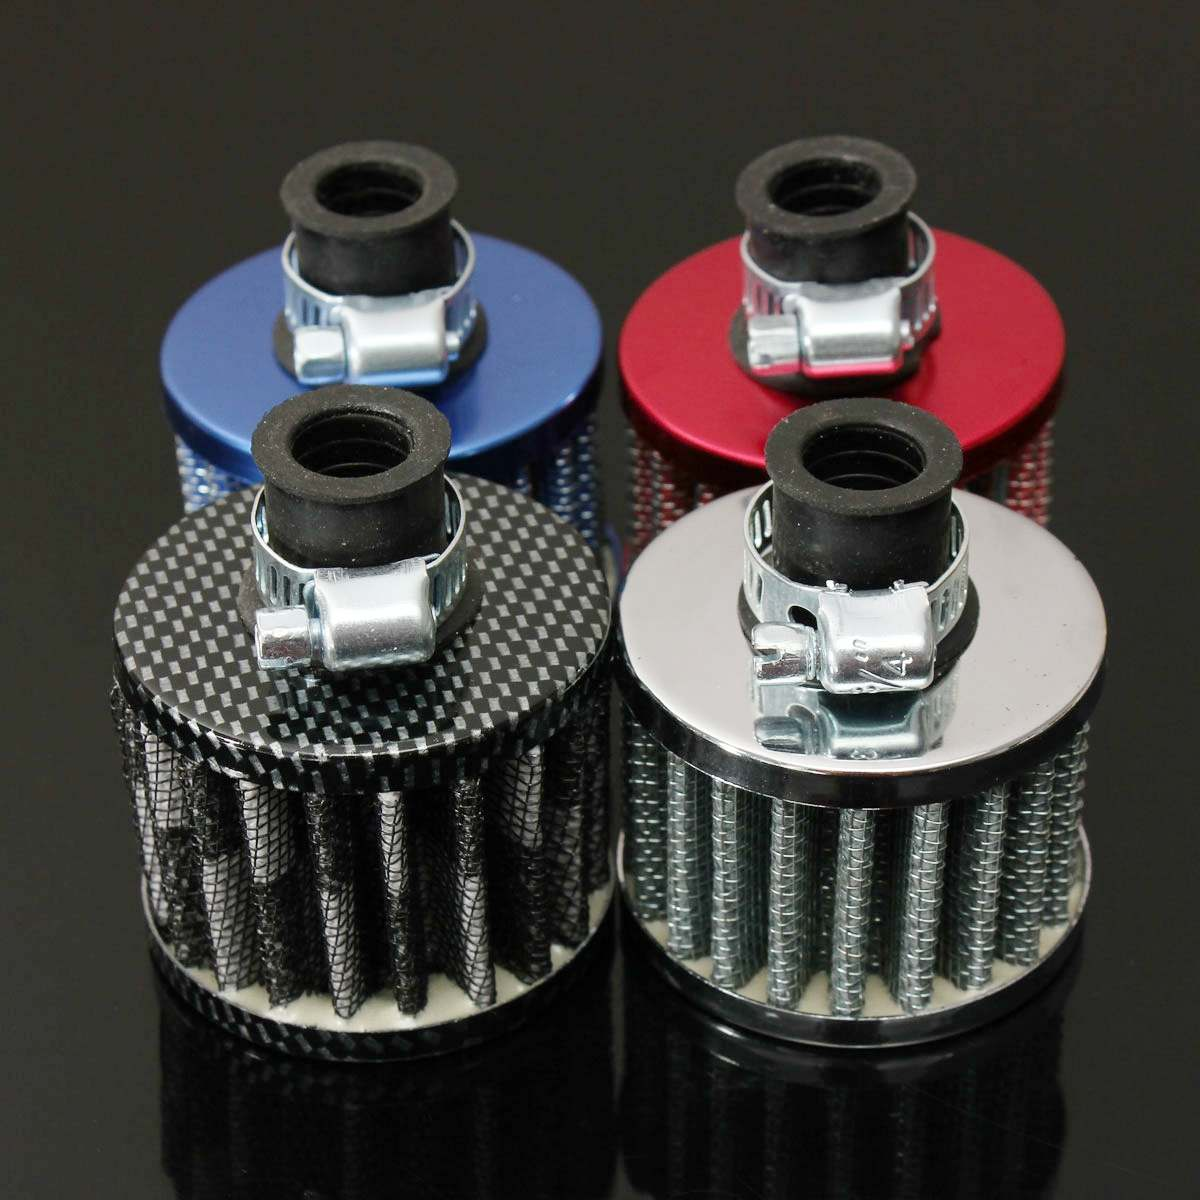 Kit de Filtro de aire frío de aceite de Motor duradero Universal de 12mm de alta calidad cárter de estator respiradero